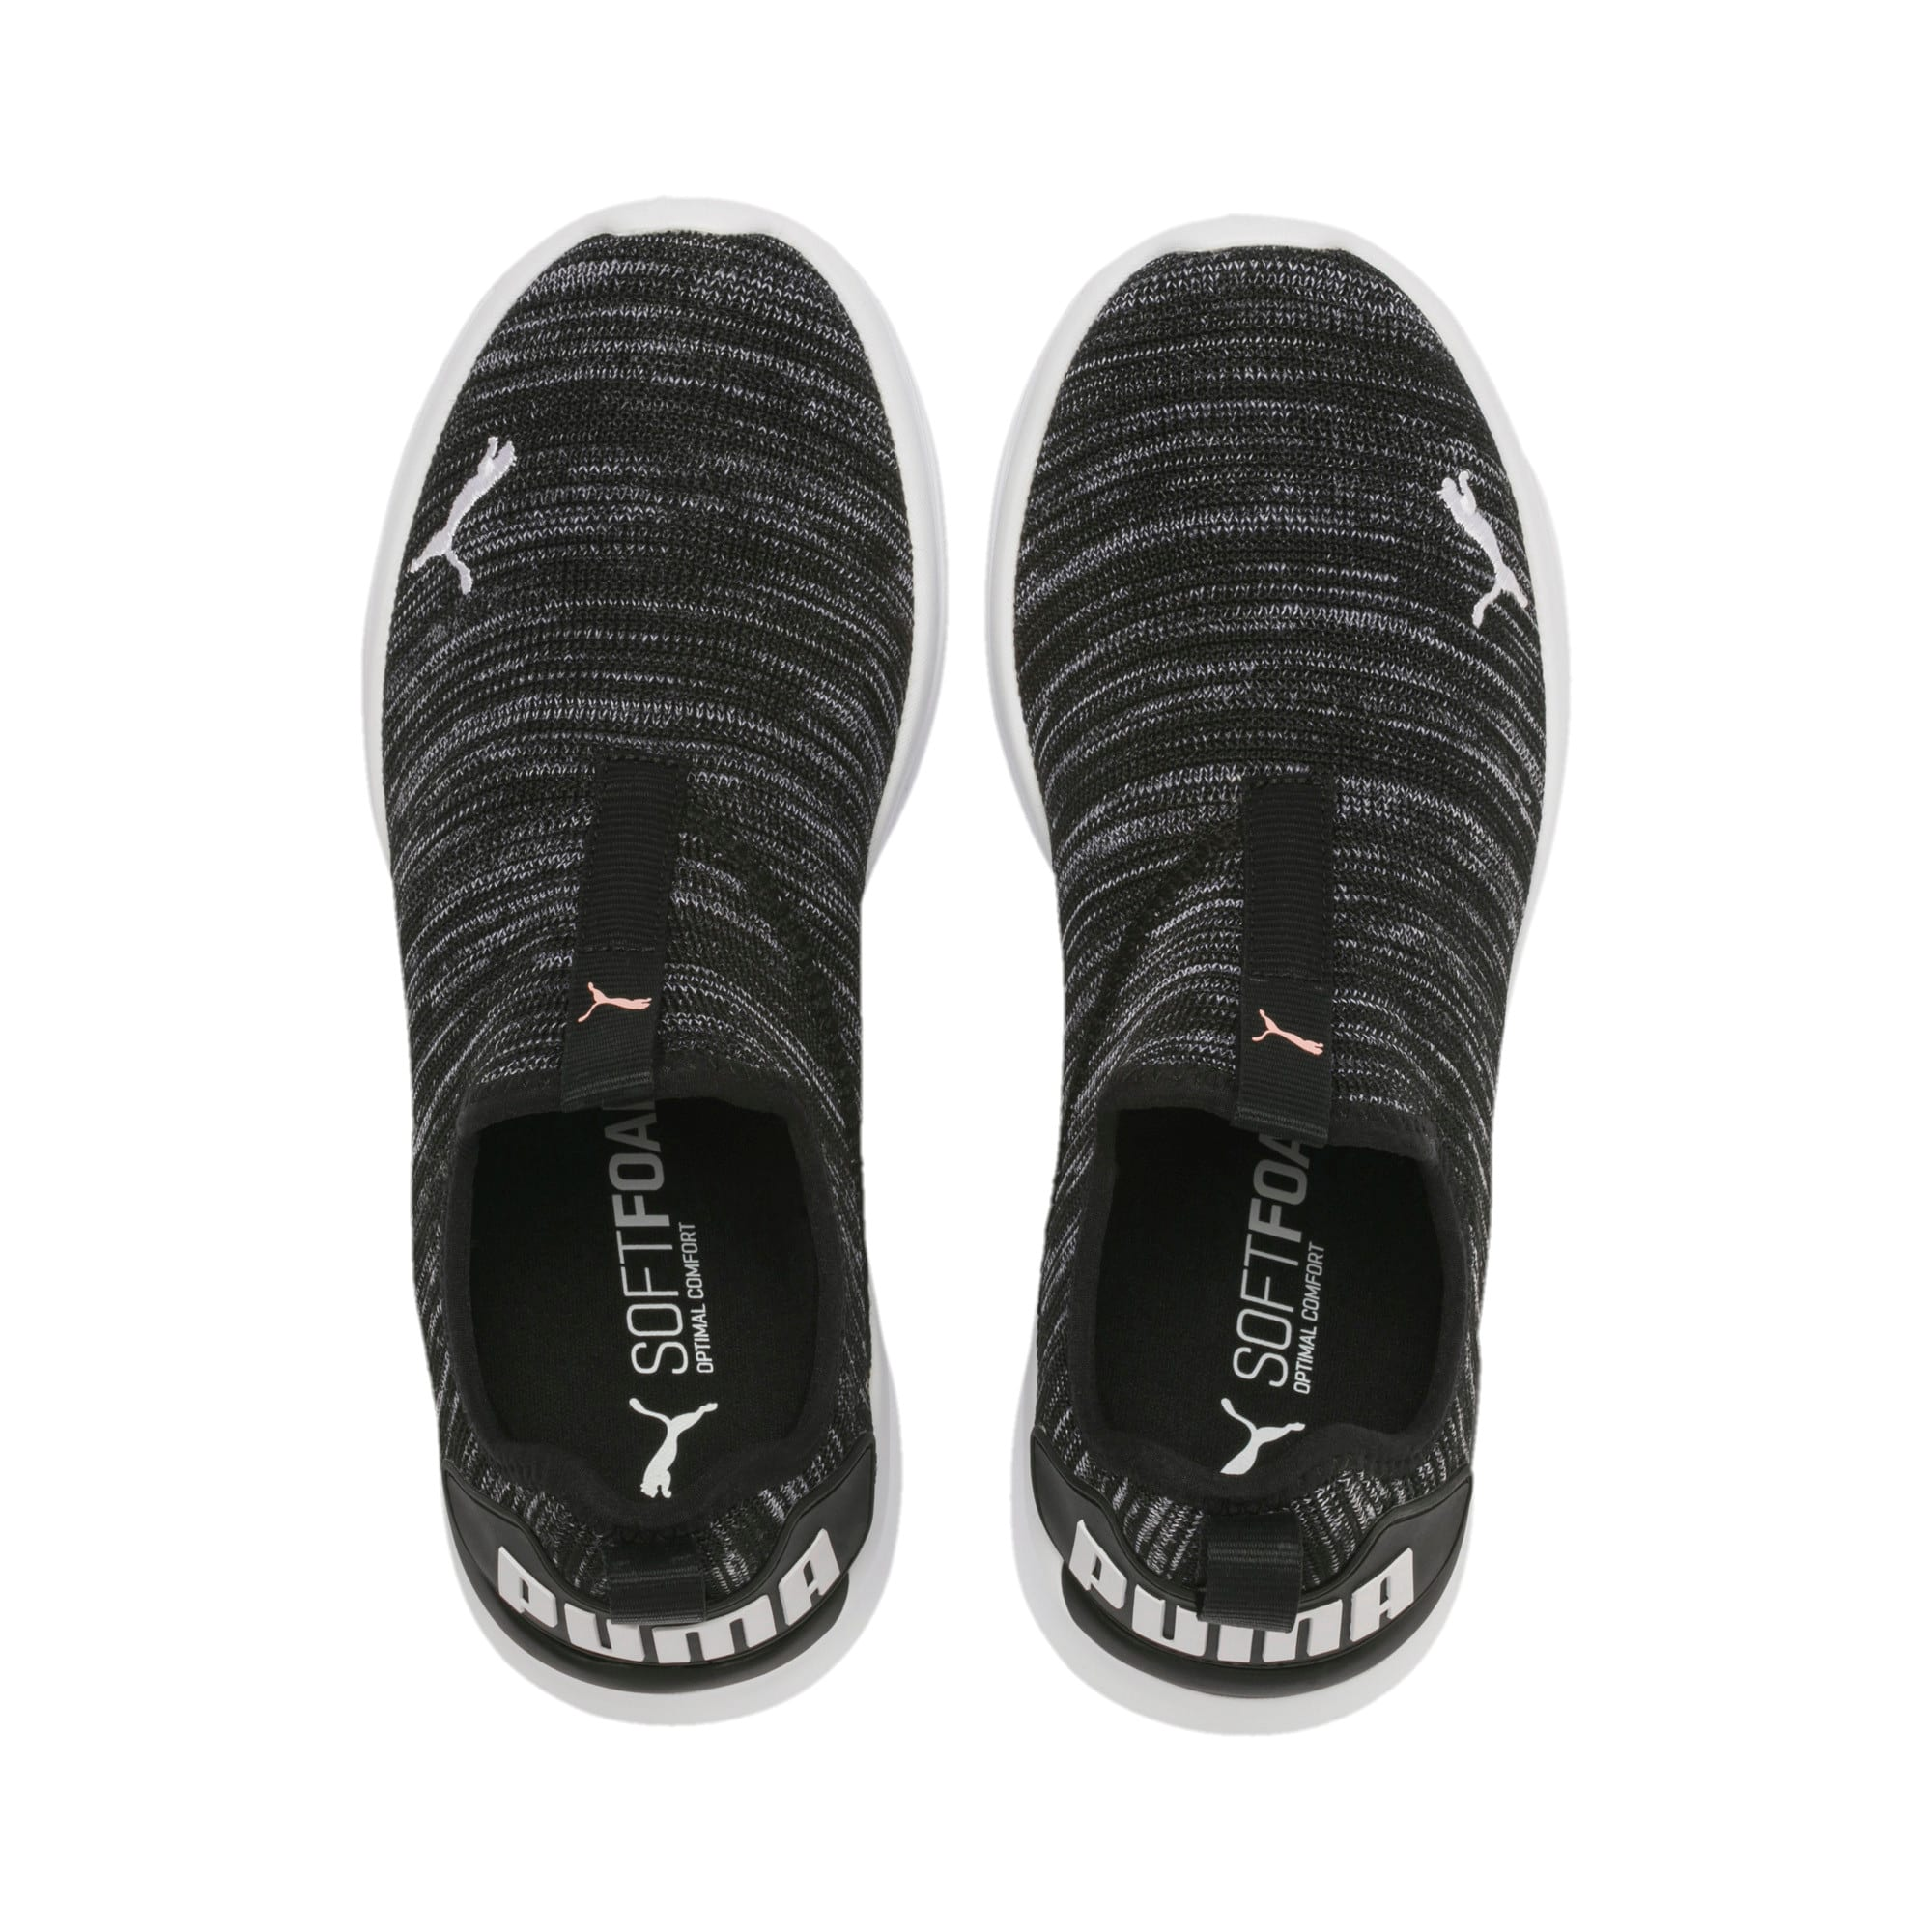 Thumbnail 7 of IGNITE Flash Summer Slip Women's Training Shoes, Puma Black-Puma White, medium